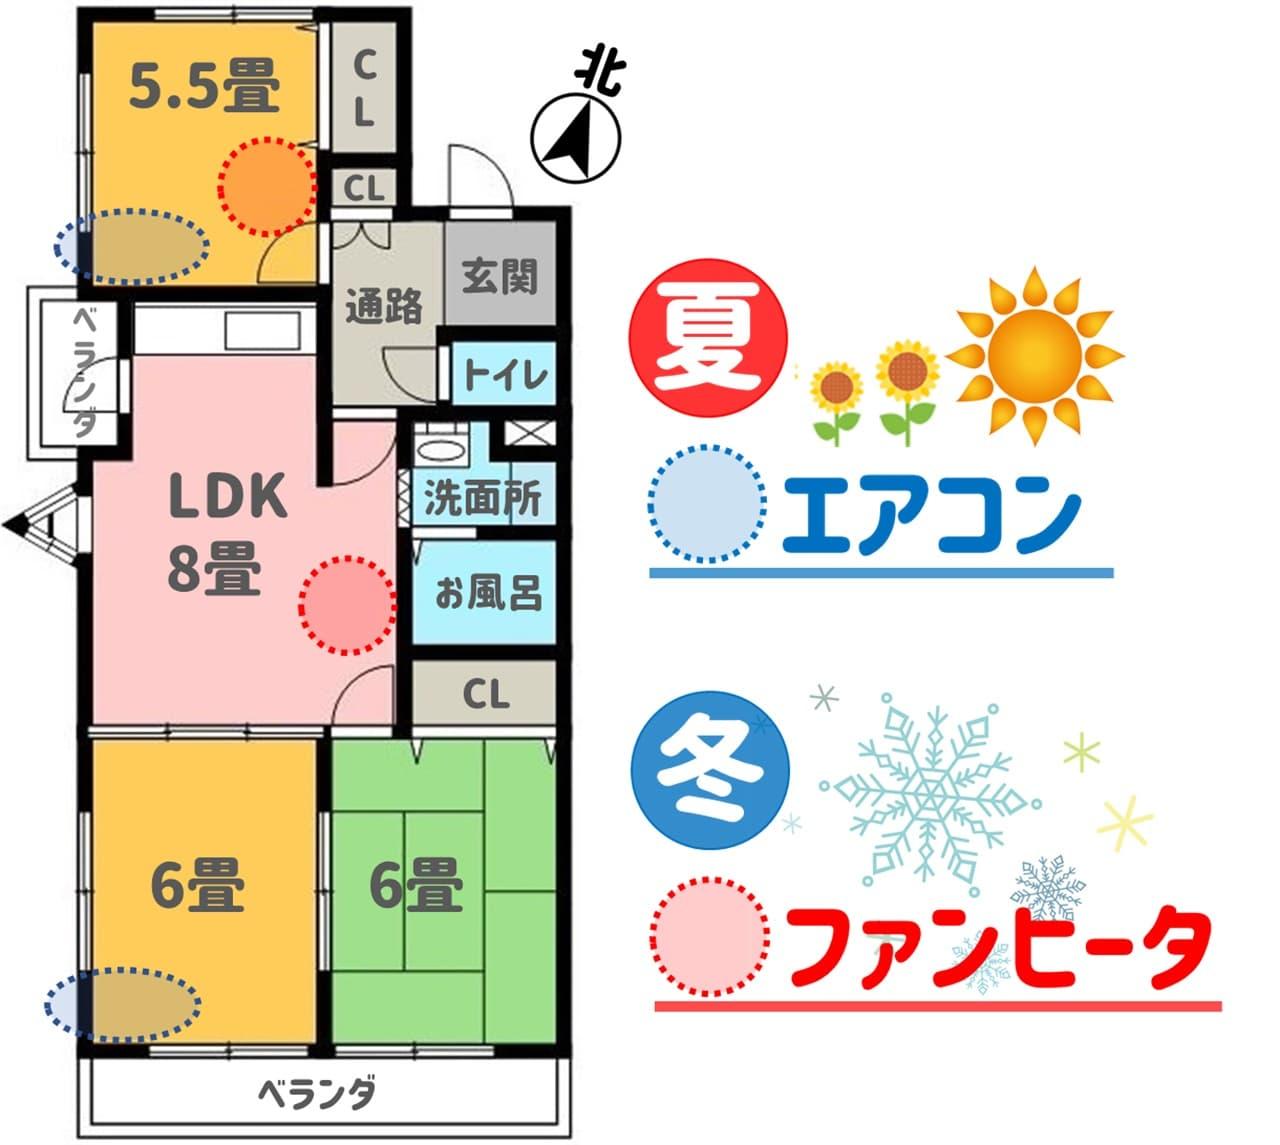 3LDK家族3人暮らしの夏冬の水道光熱費に影響する冷暖房の配置場所